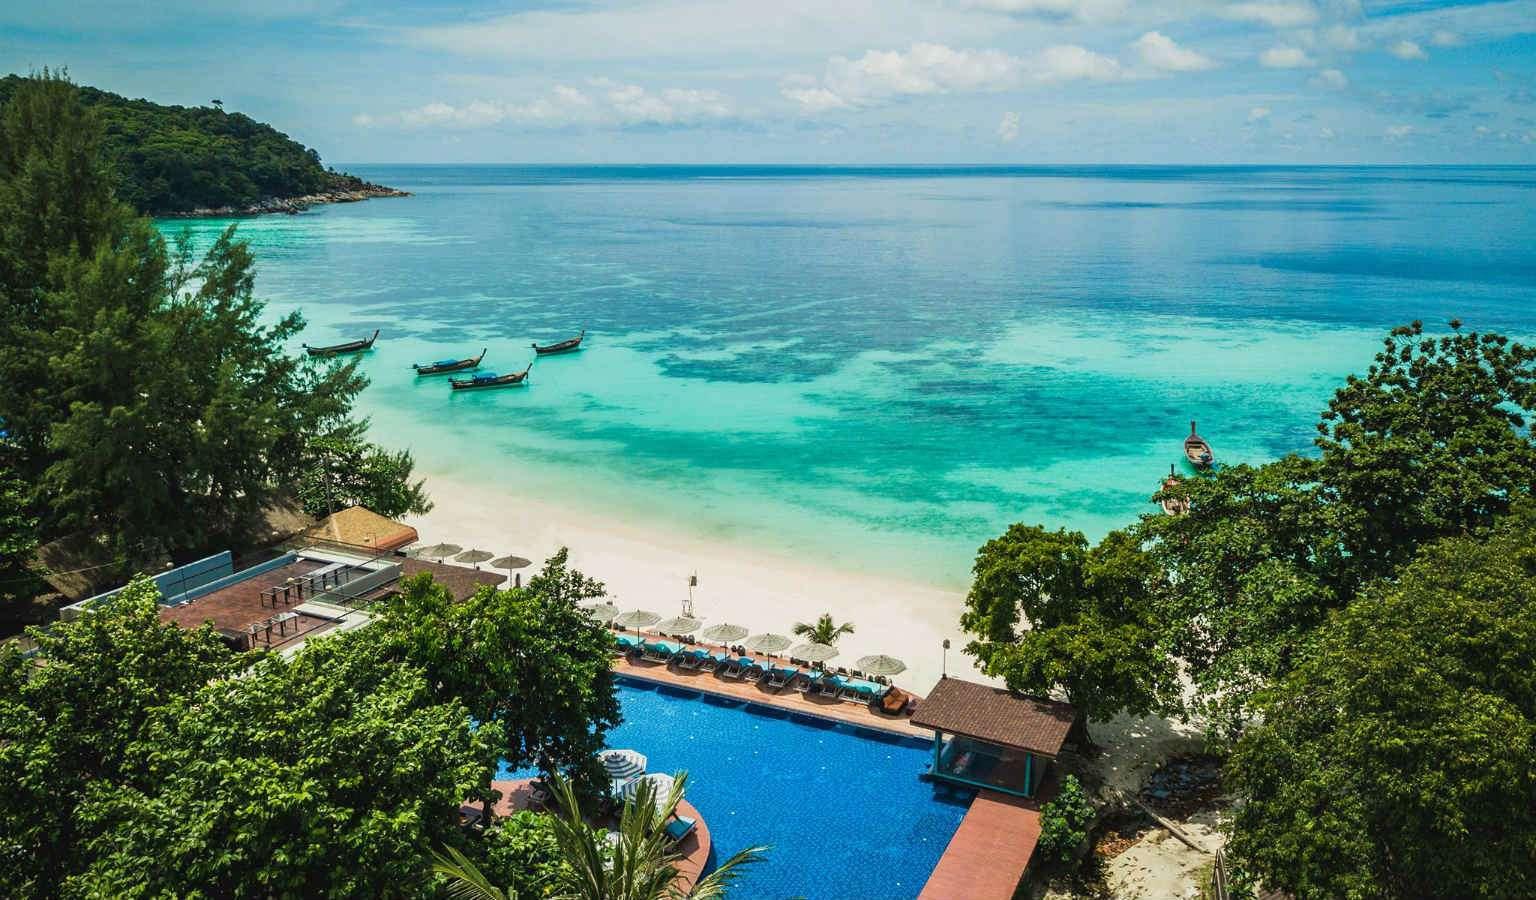 Het Akira Resort gelegen aan Pattaya Beach in Koh Lipe, Thailand